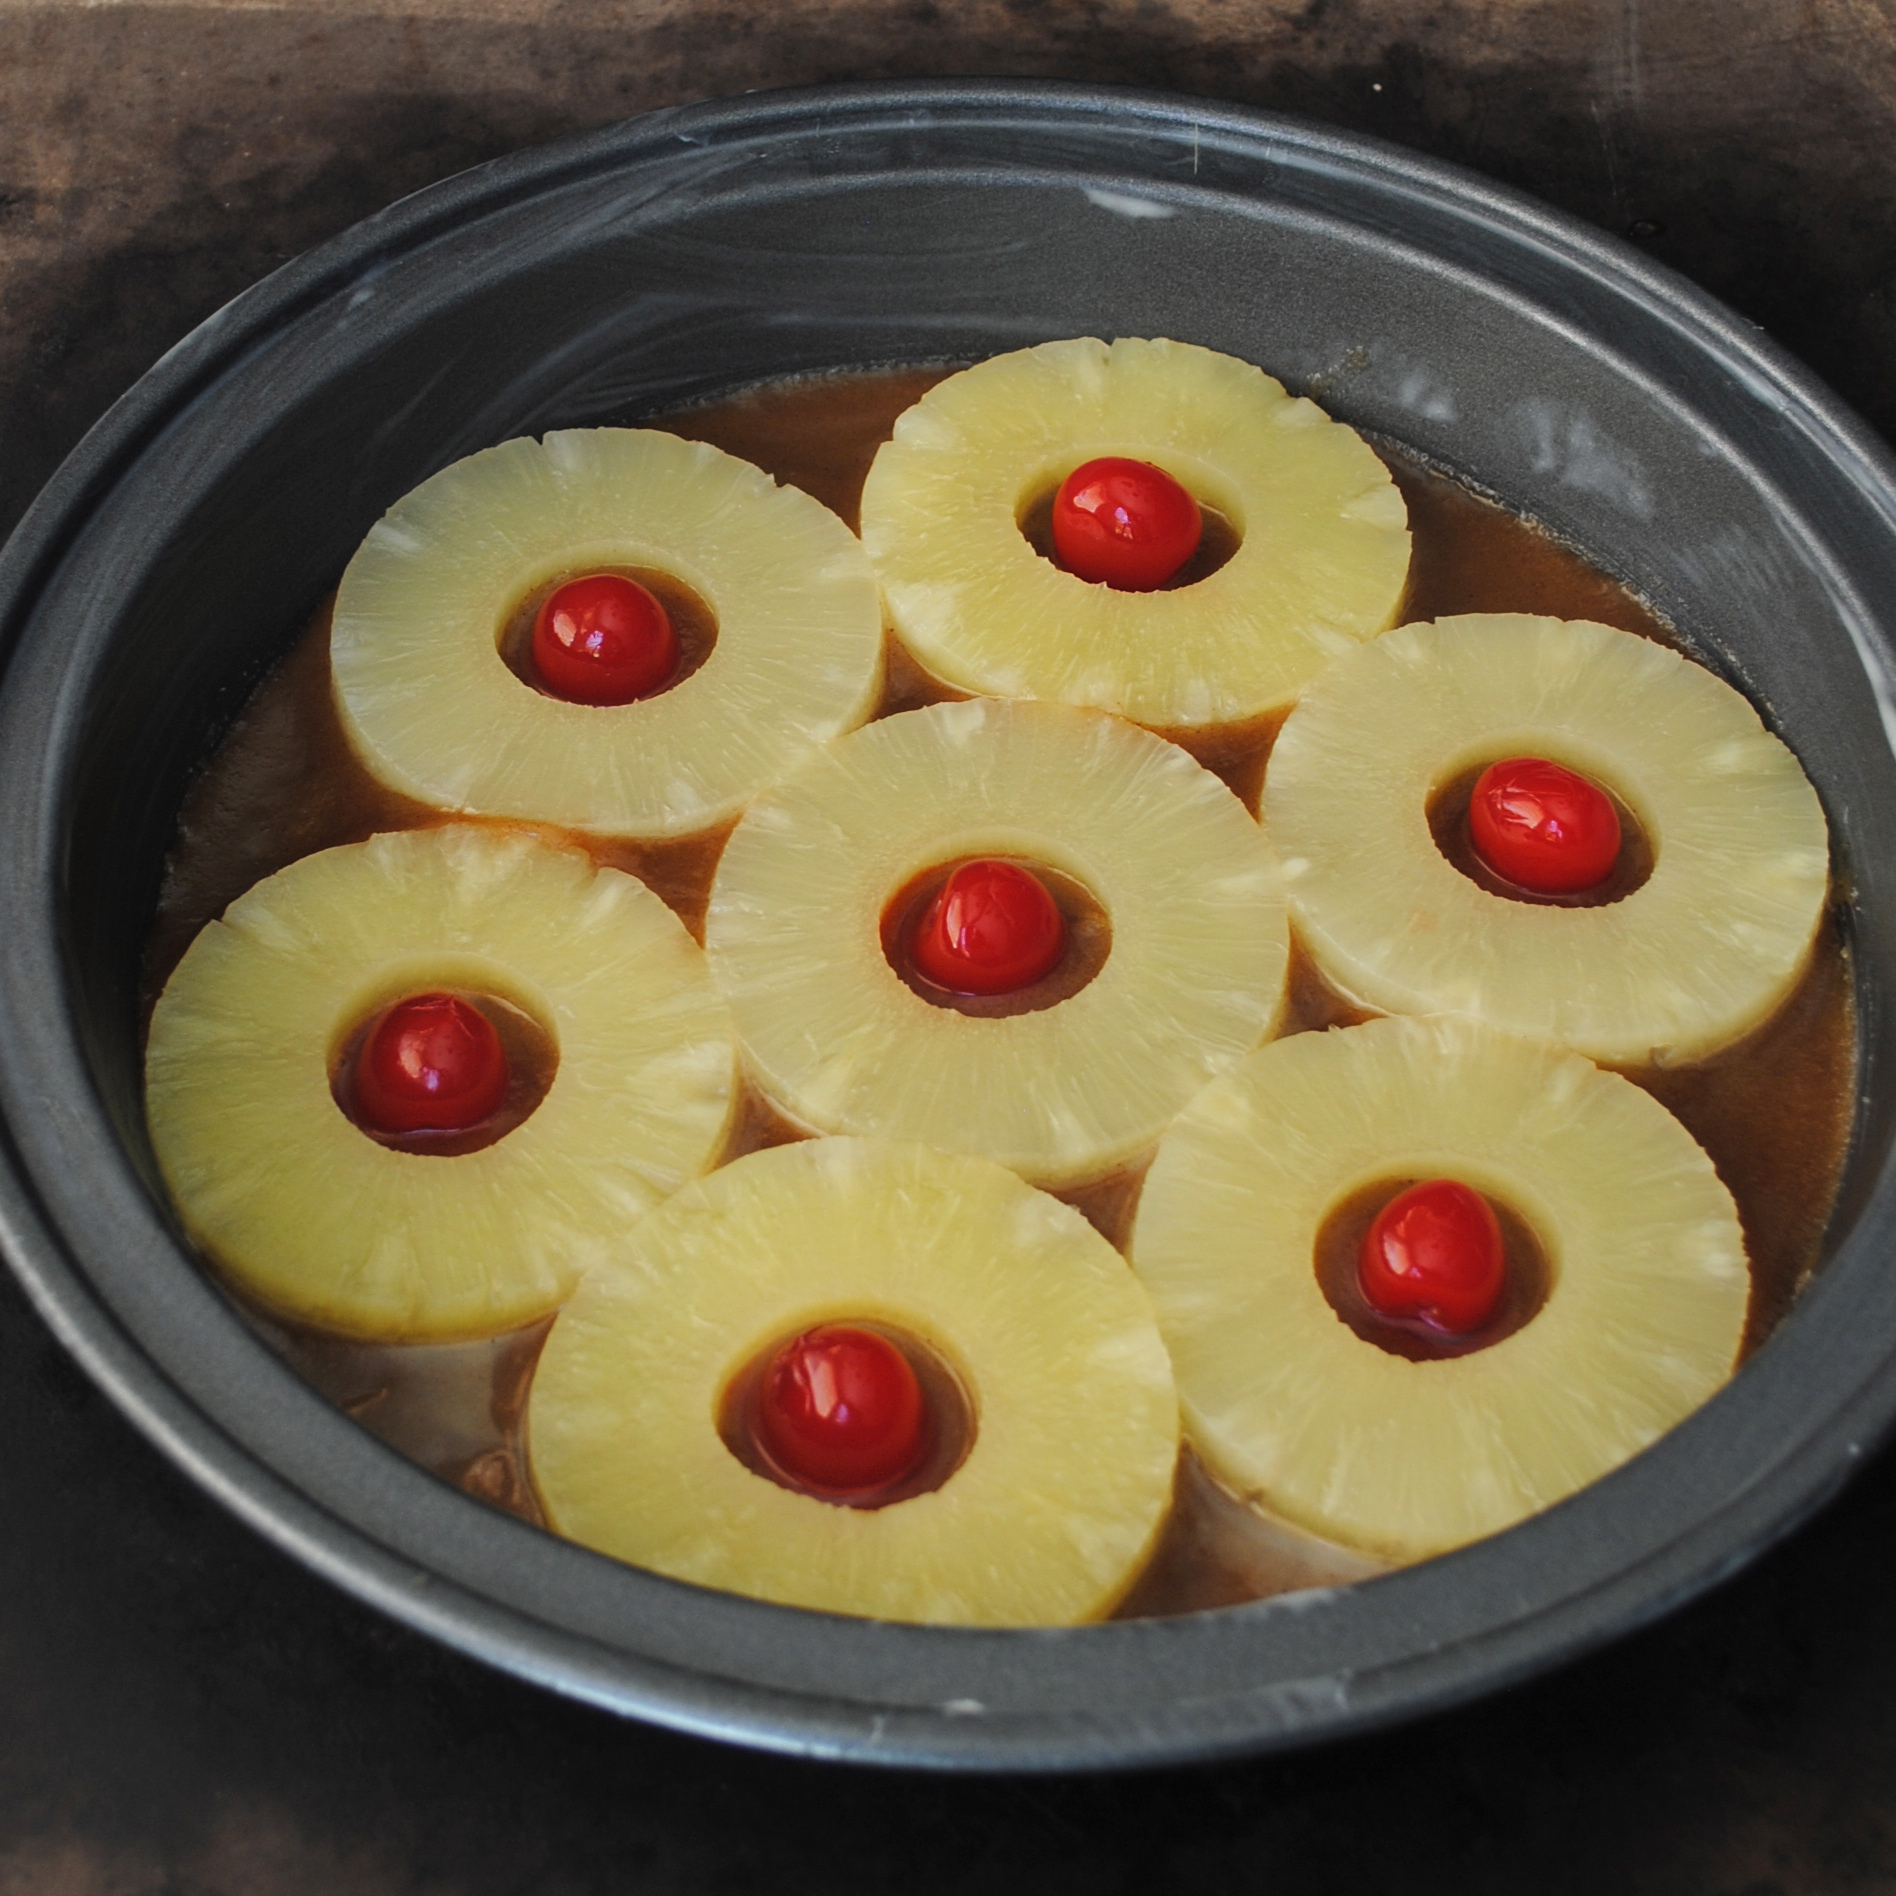 Preparing the pan for Pineapple Upside Down Cake